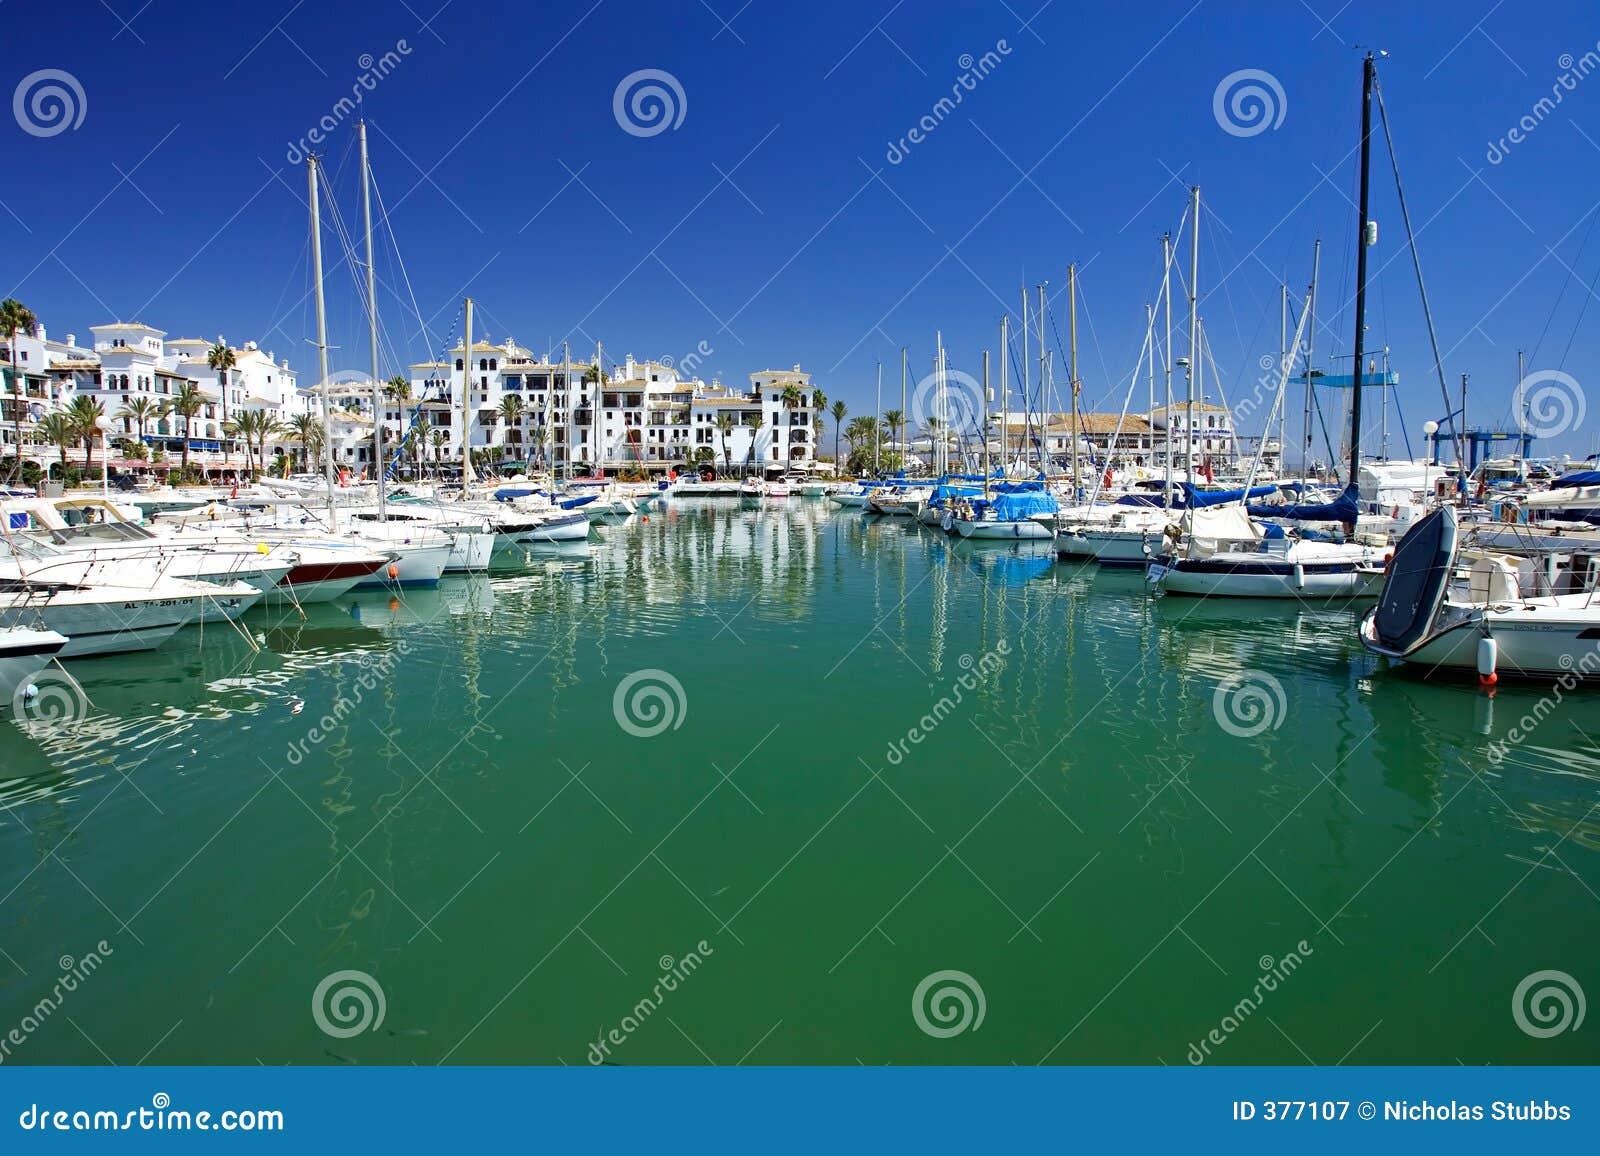 Fartyg costa de duquesa förtöjde portspain yachter